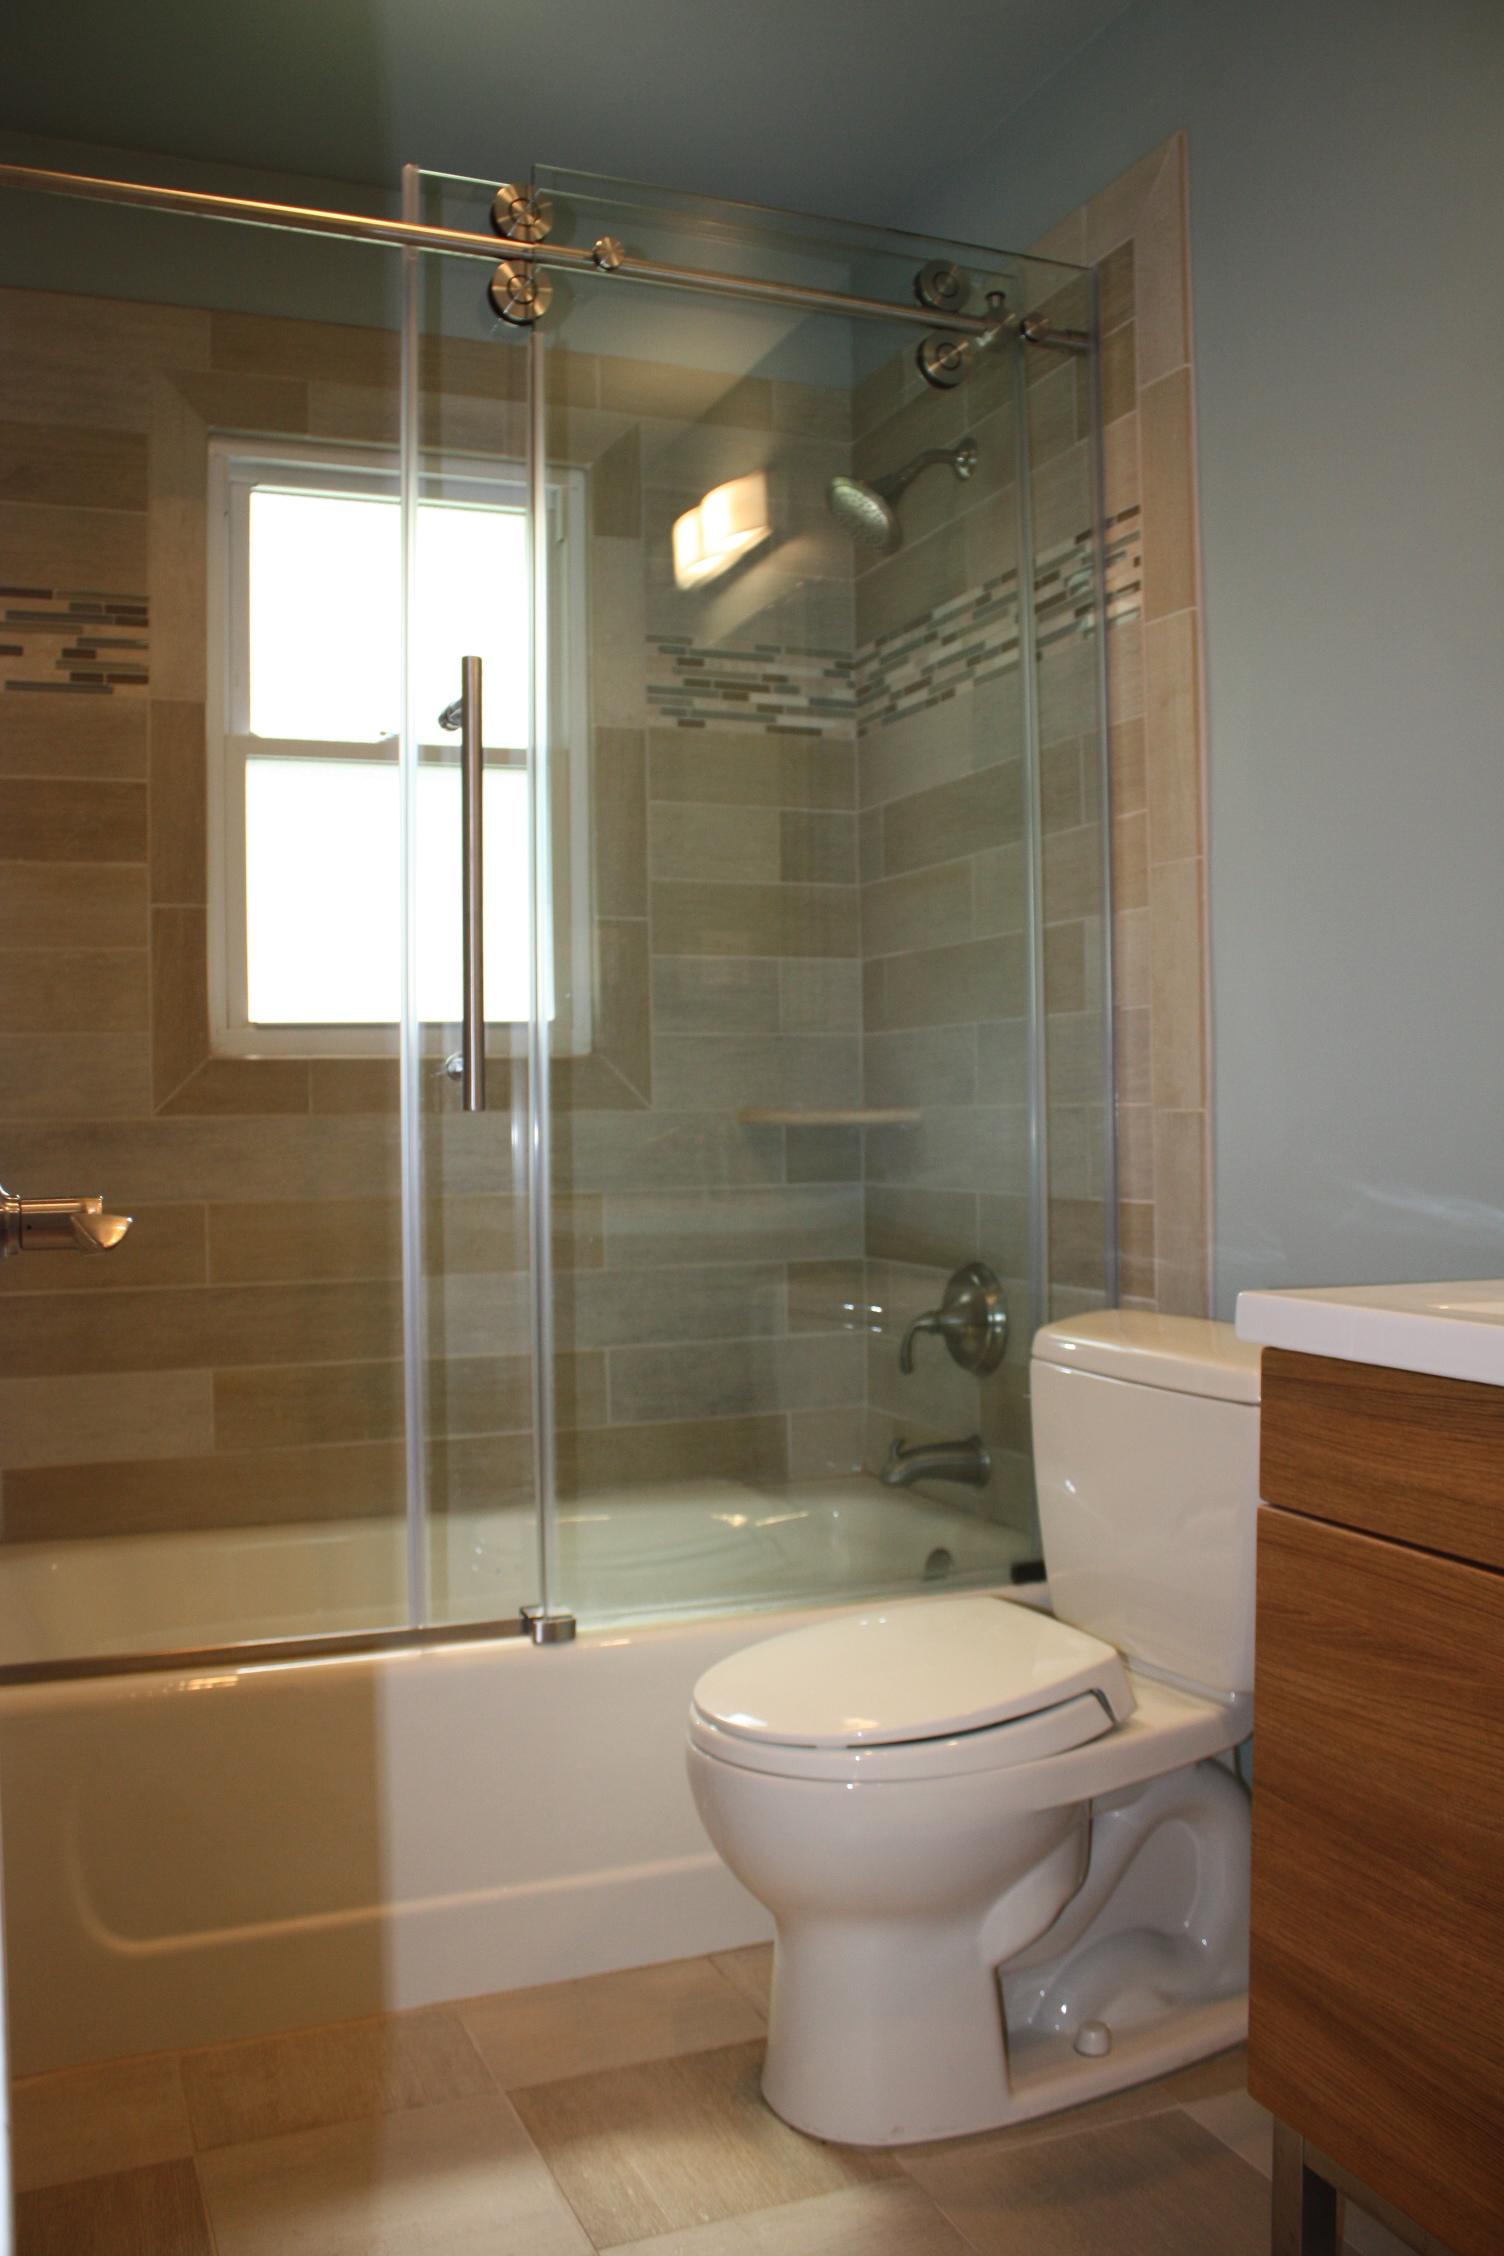 cvisions_bathroom_remodel5.JPG